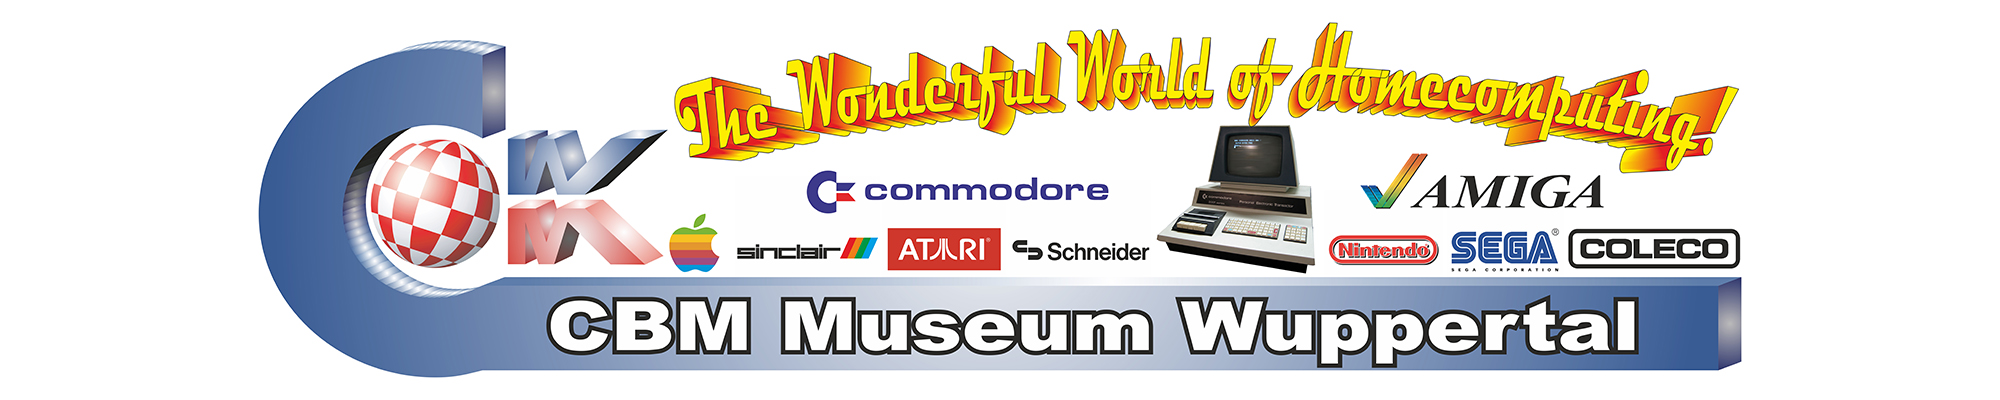 CBM Museum Wuppertal